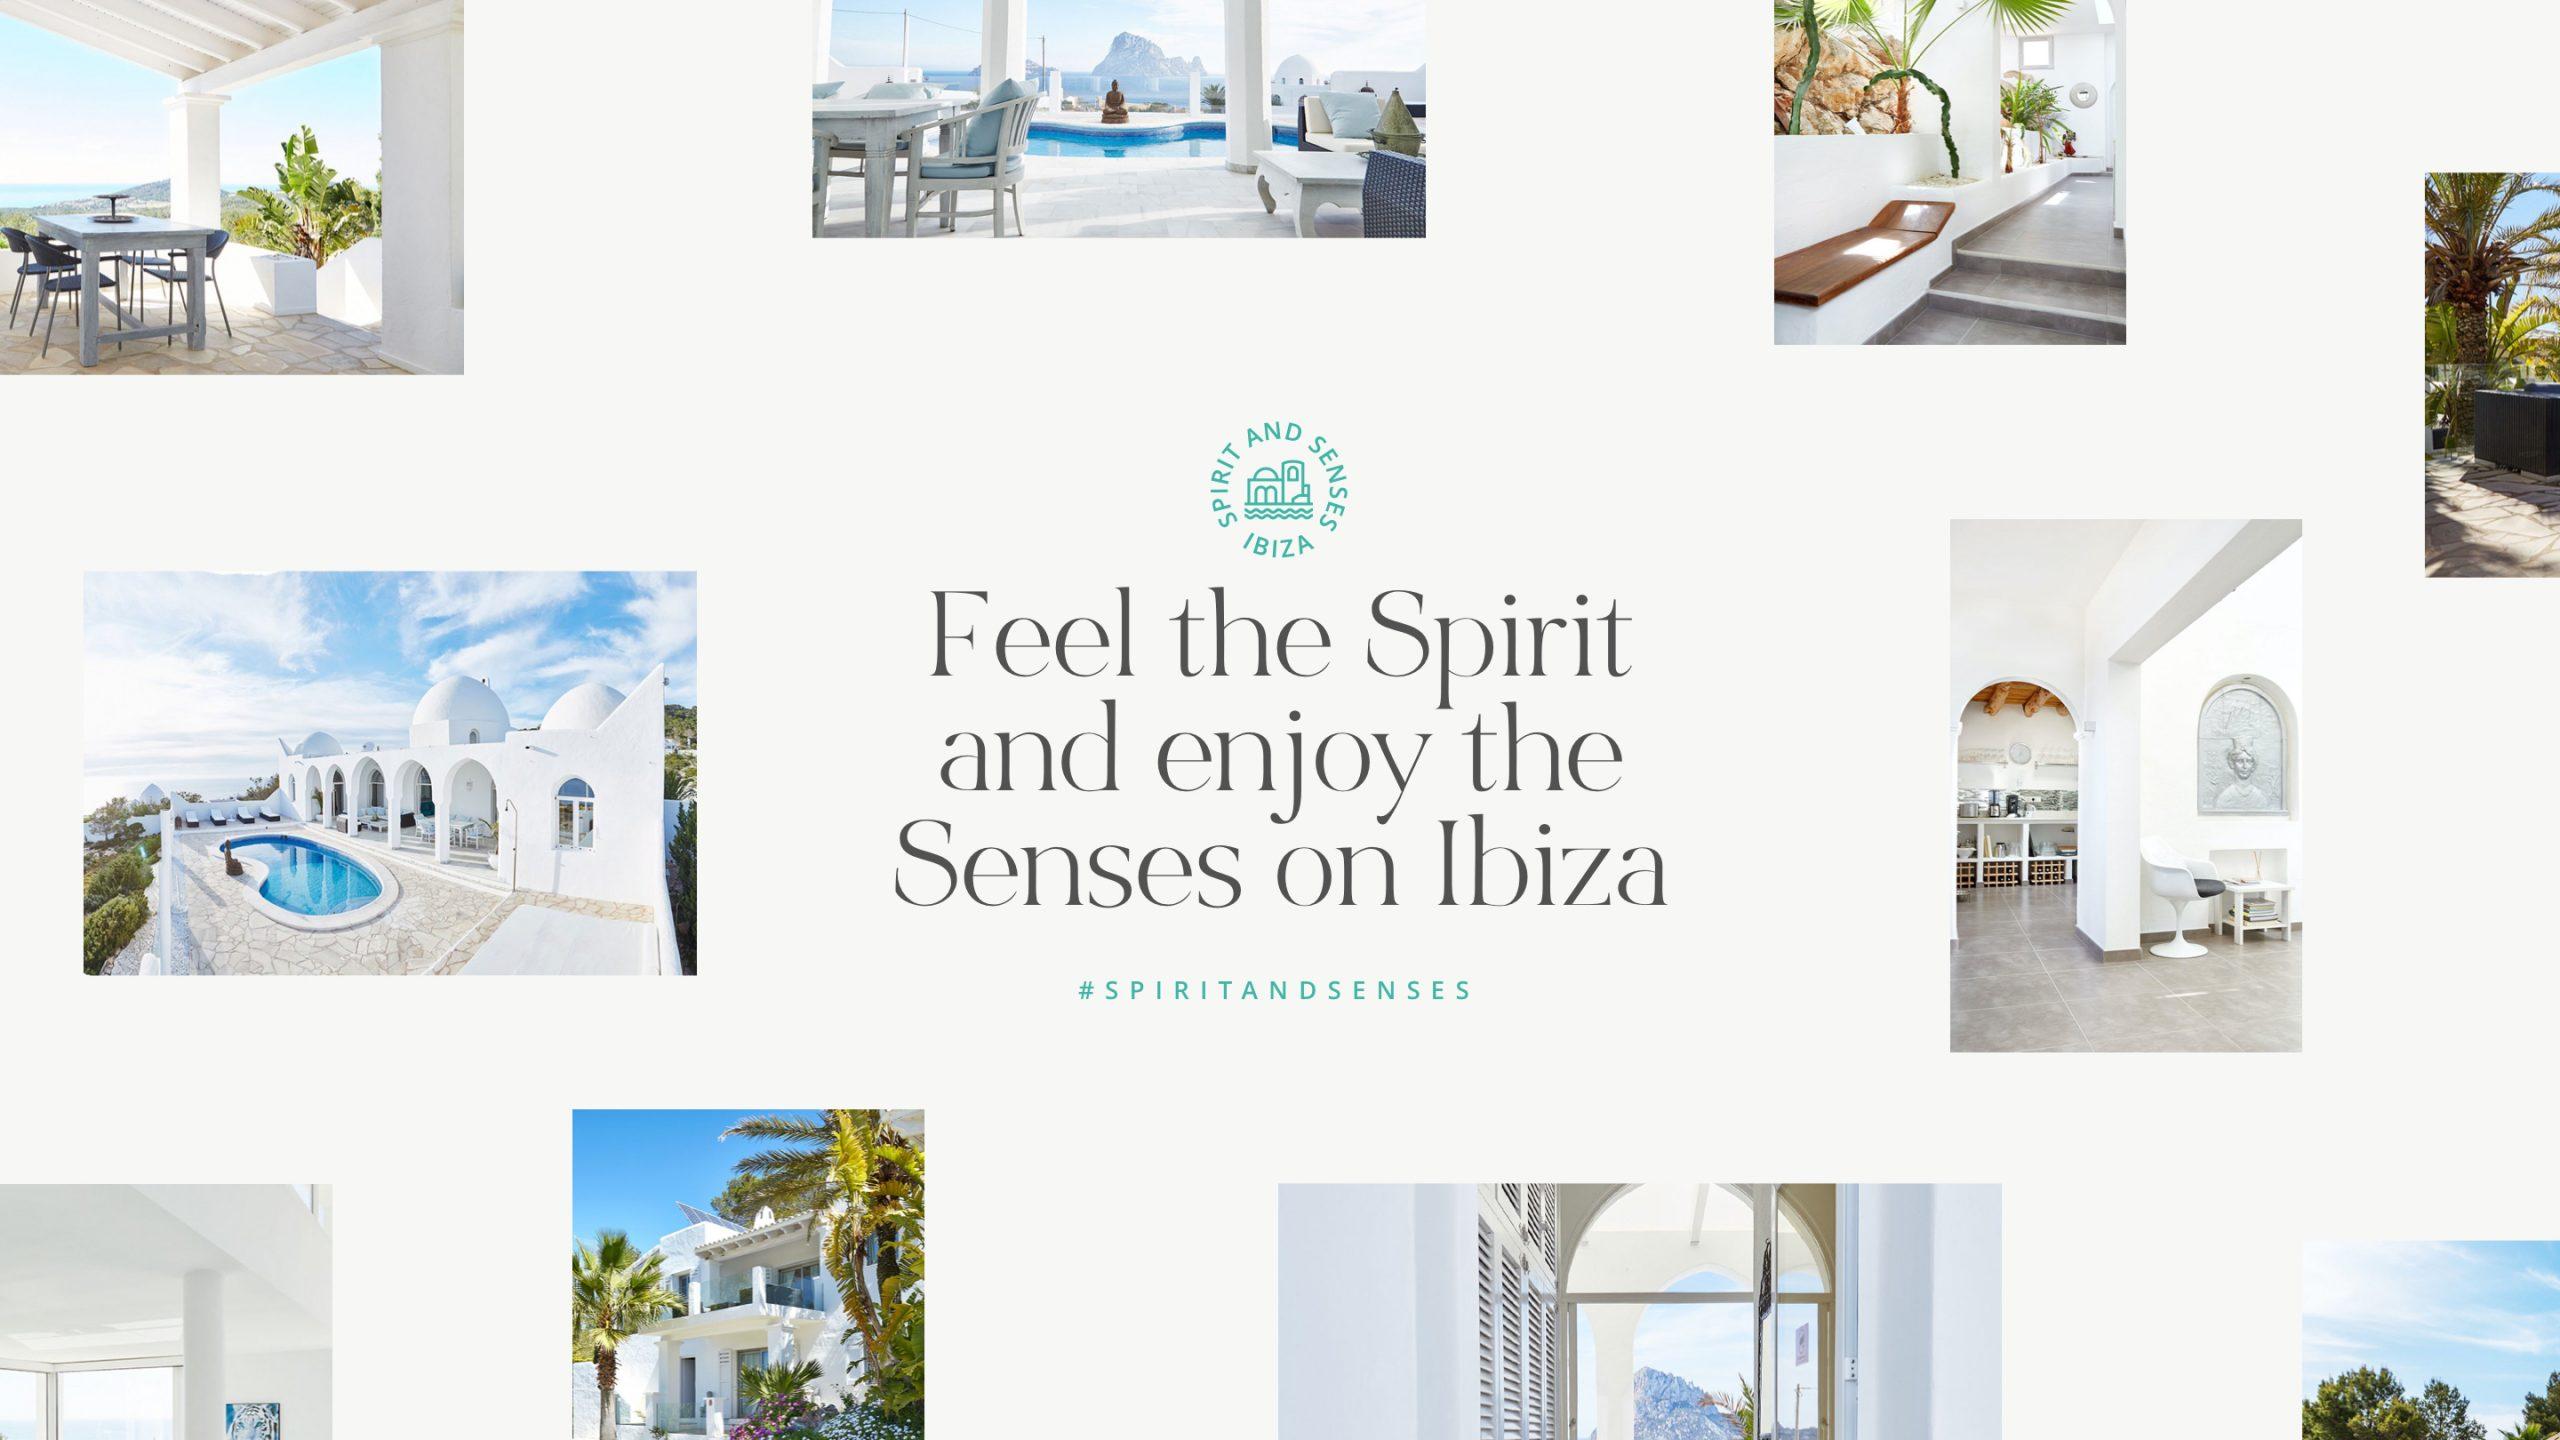 86-spirit-and-senses-ibiza